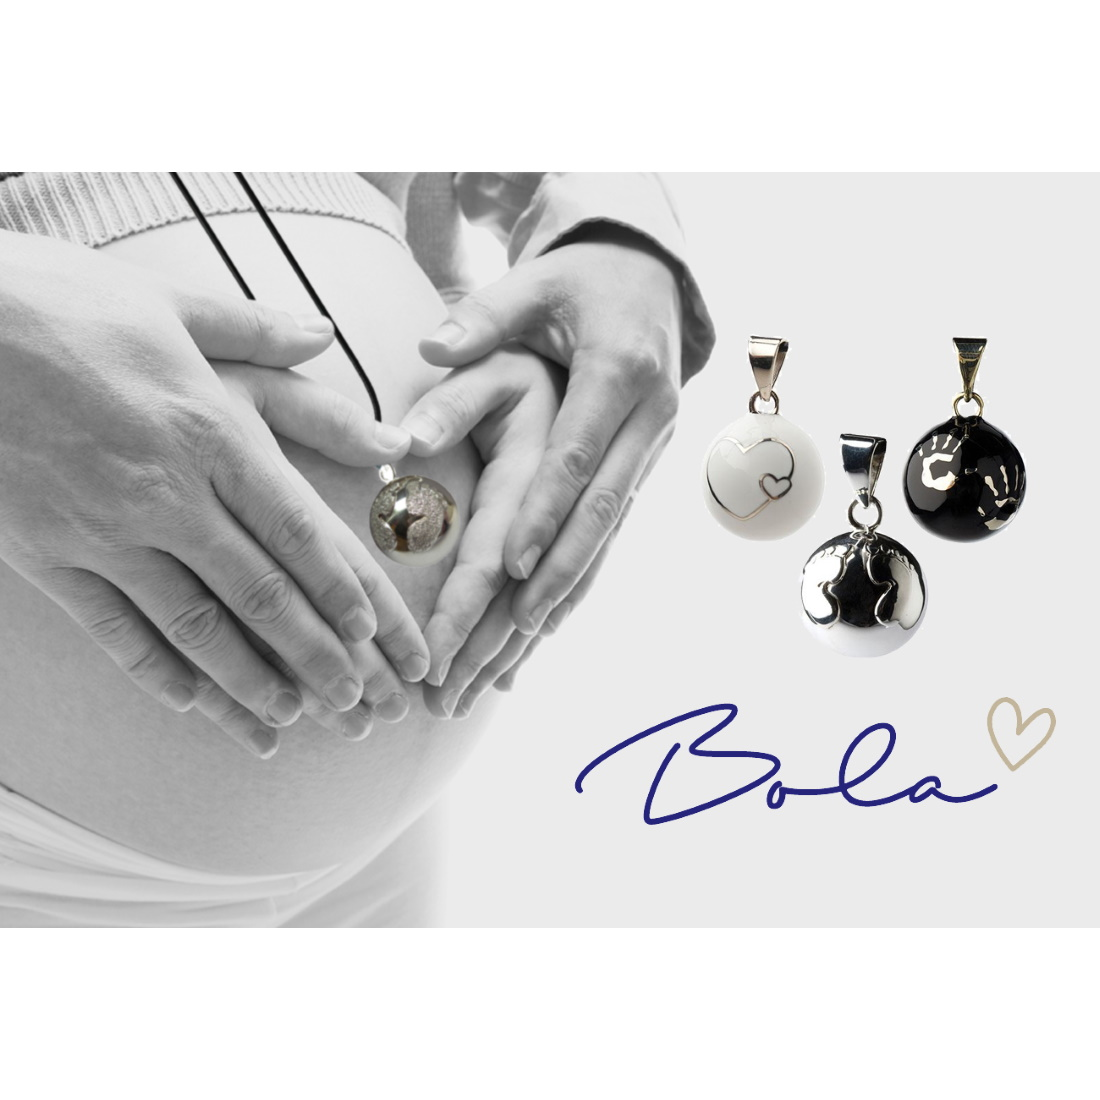 Bola Μενταγιόν Εγκυμοσύνης-2-1100x1100